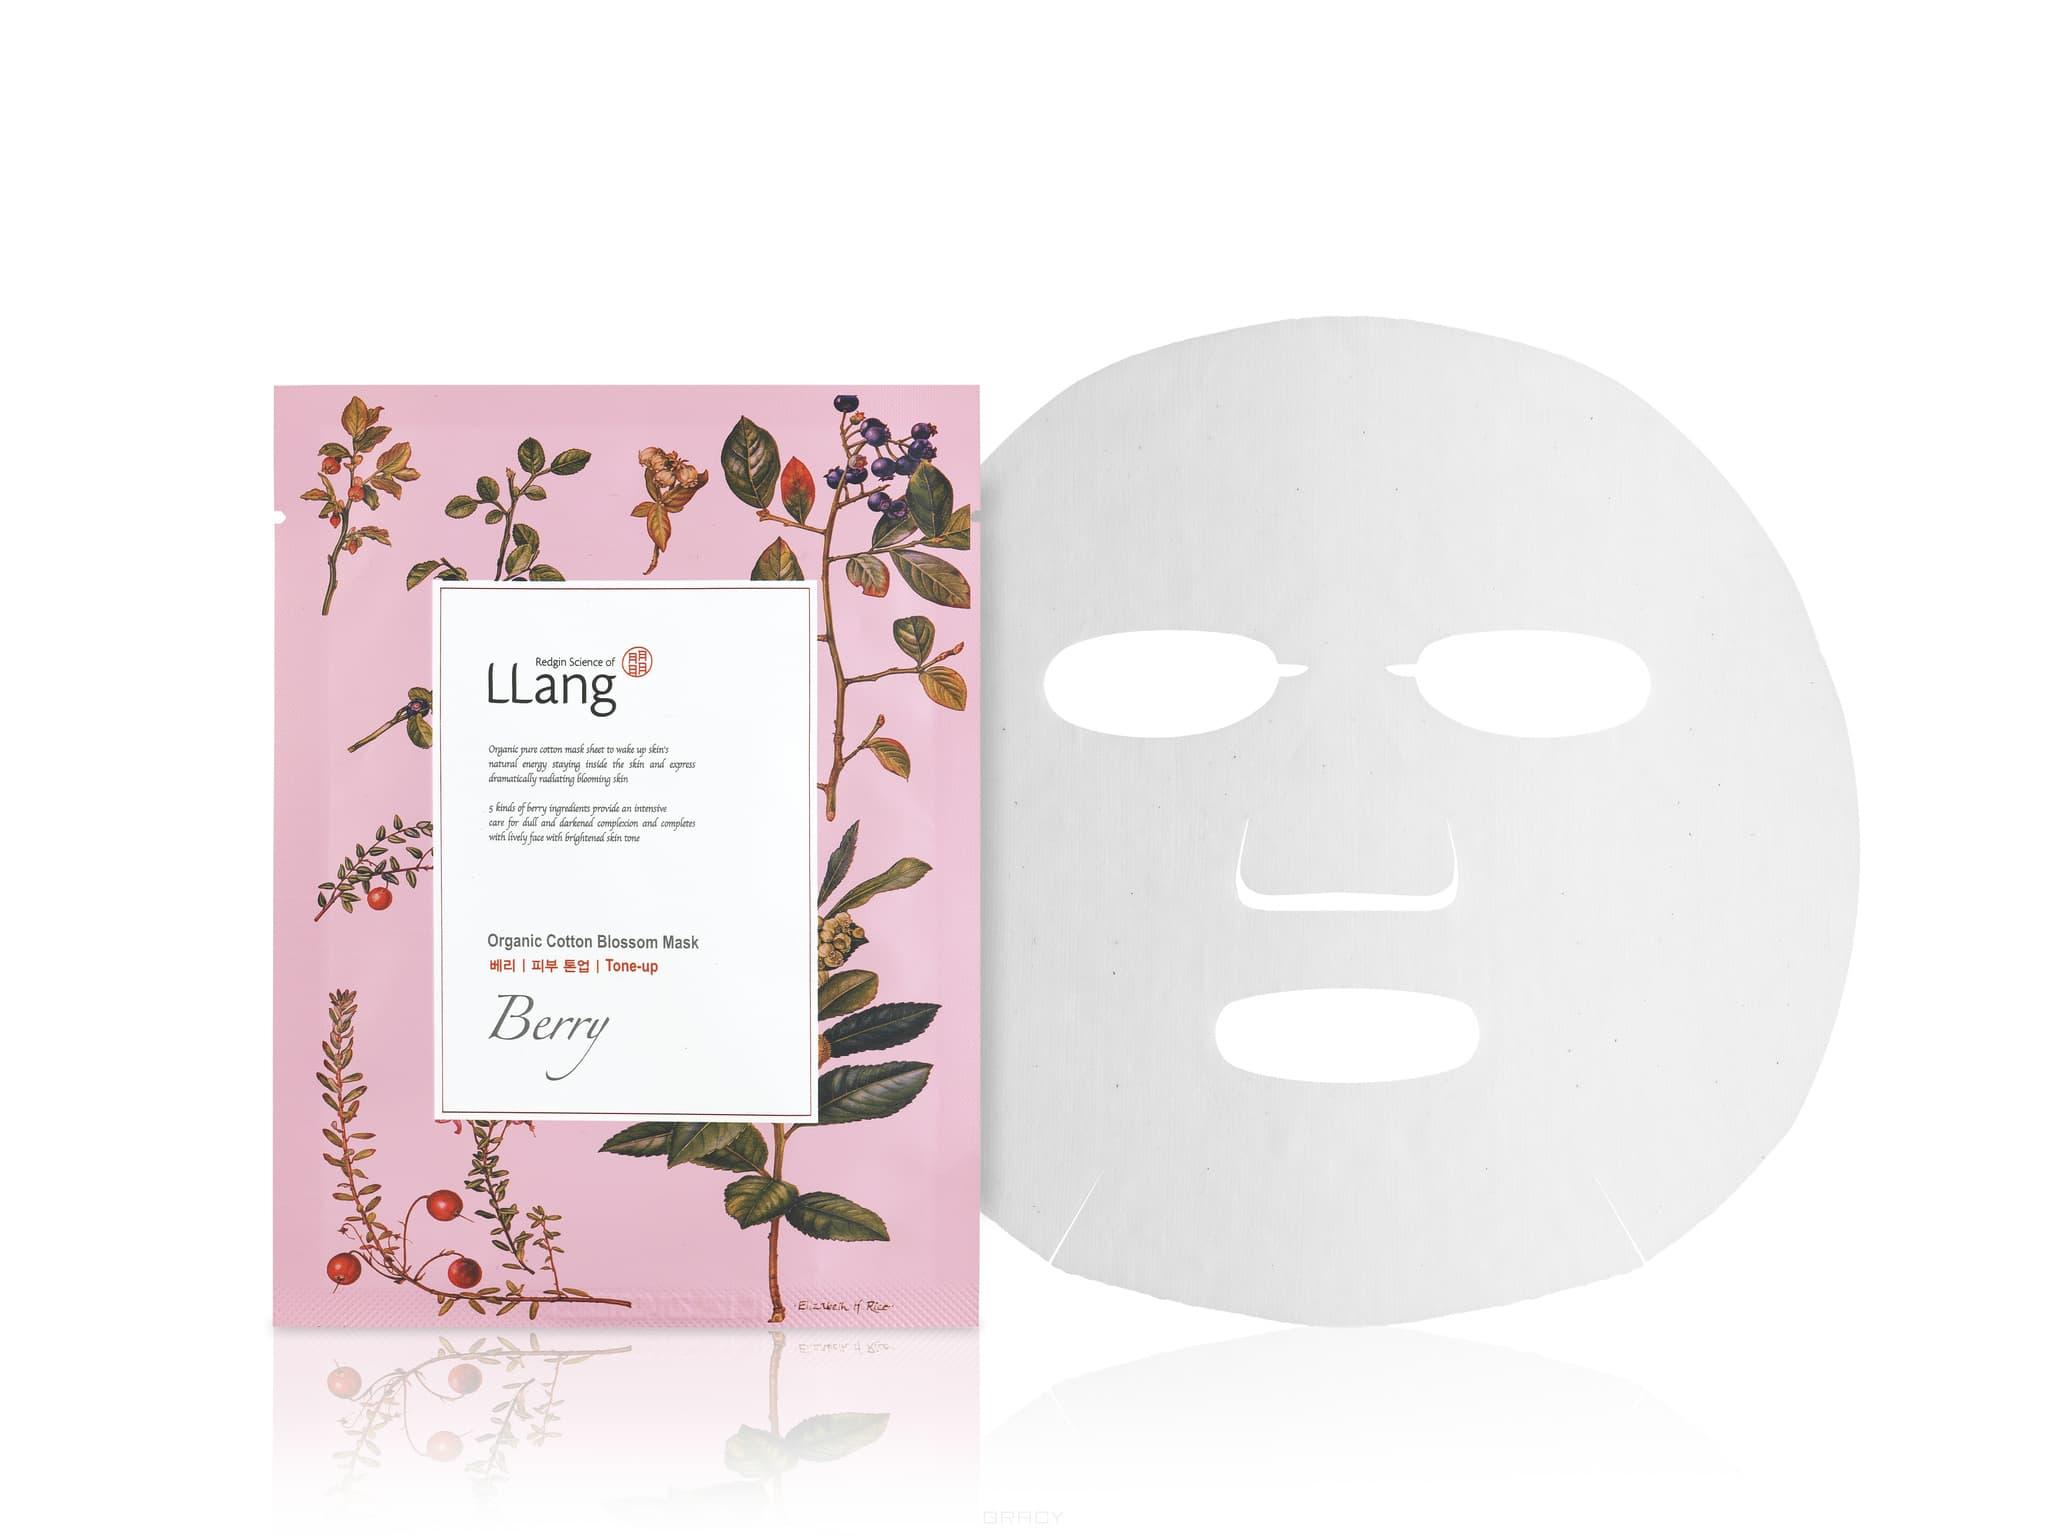 LLang Тканевая маска с экстрактом ягод Organic Cotton Blossom Mask (Berry), 20 мл 1pack blueberry extract capsule 450mg x180pcs free shipping